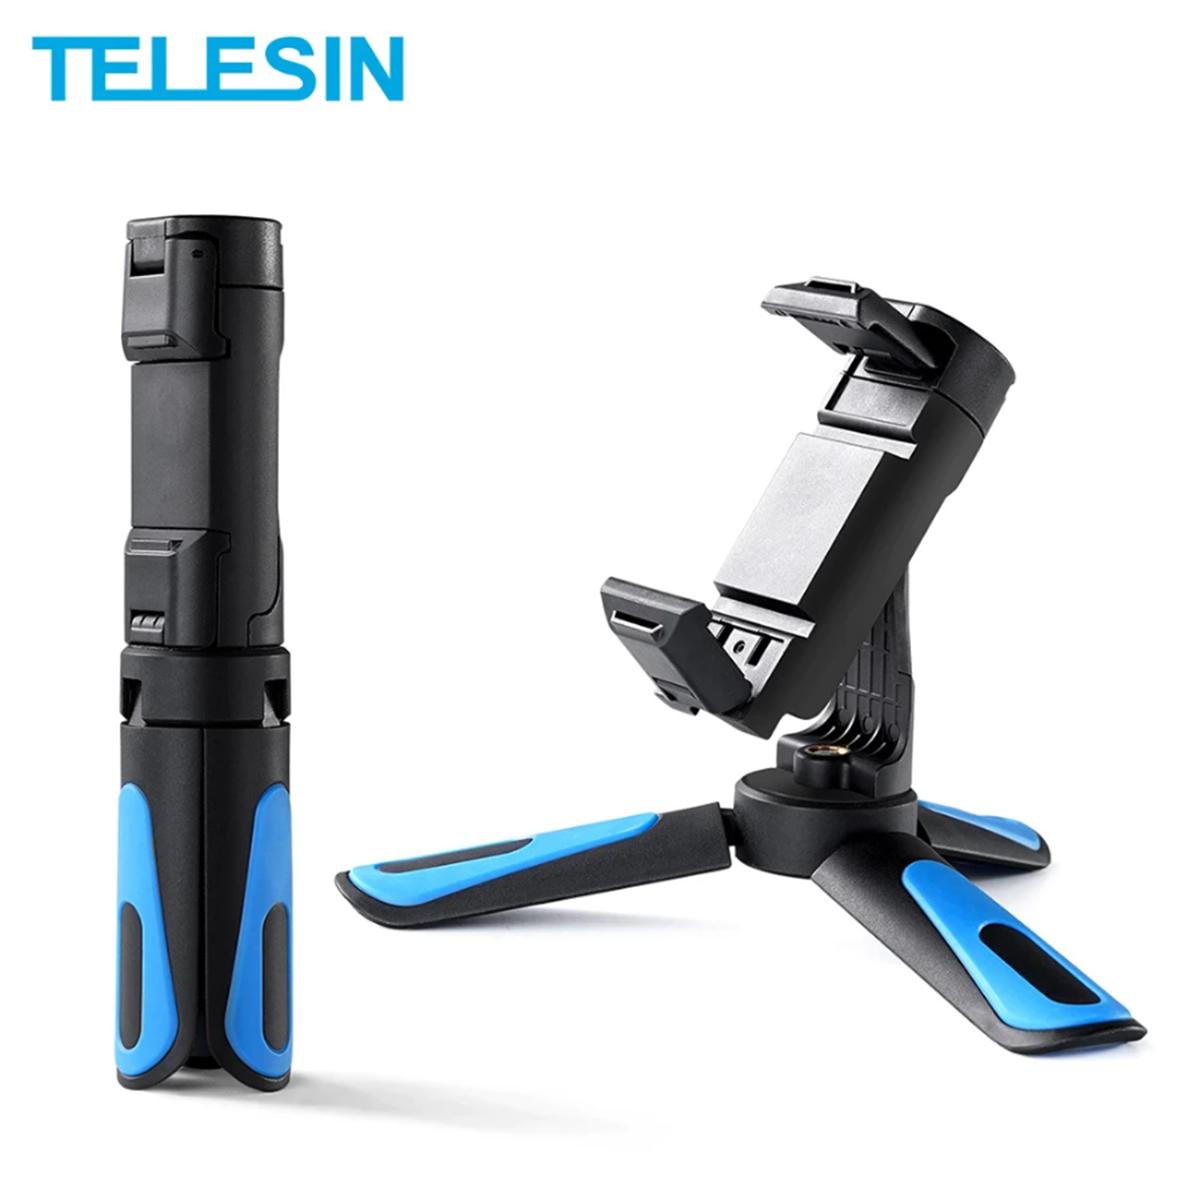 Mini Tripé de Mesa - Celular e Câmeras DSLR - Telesin